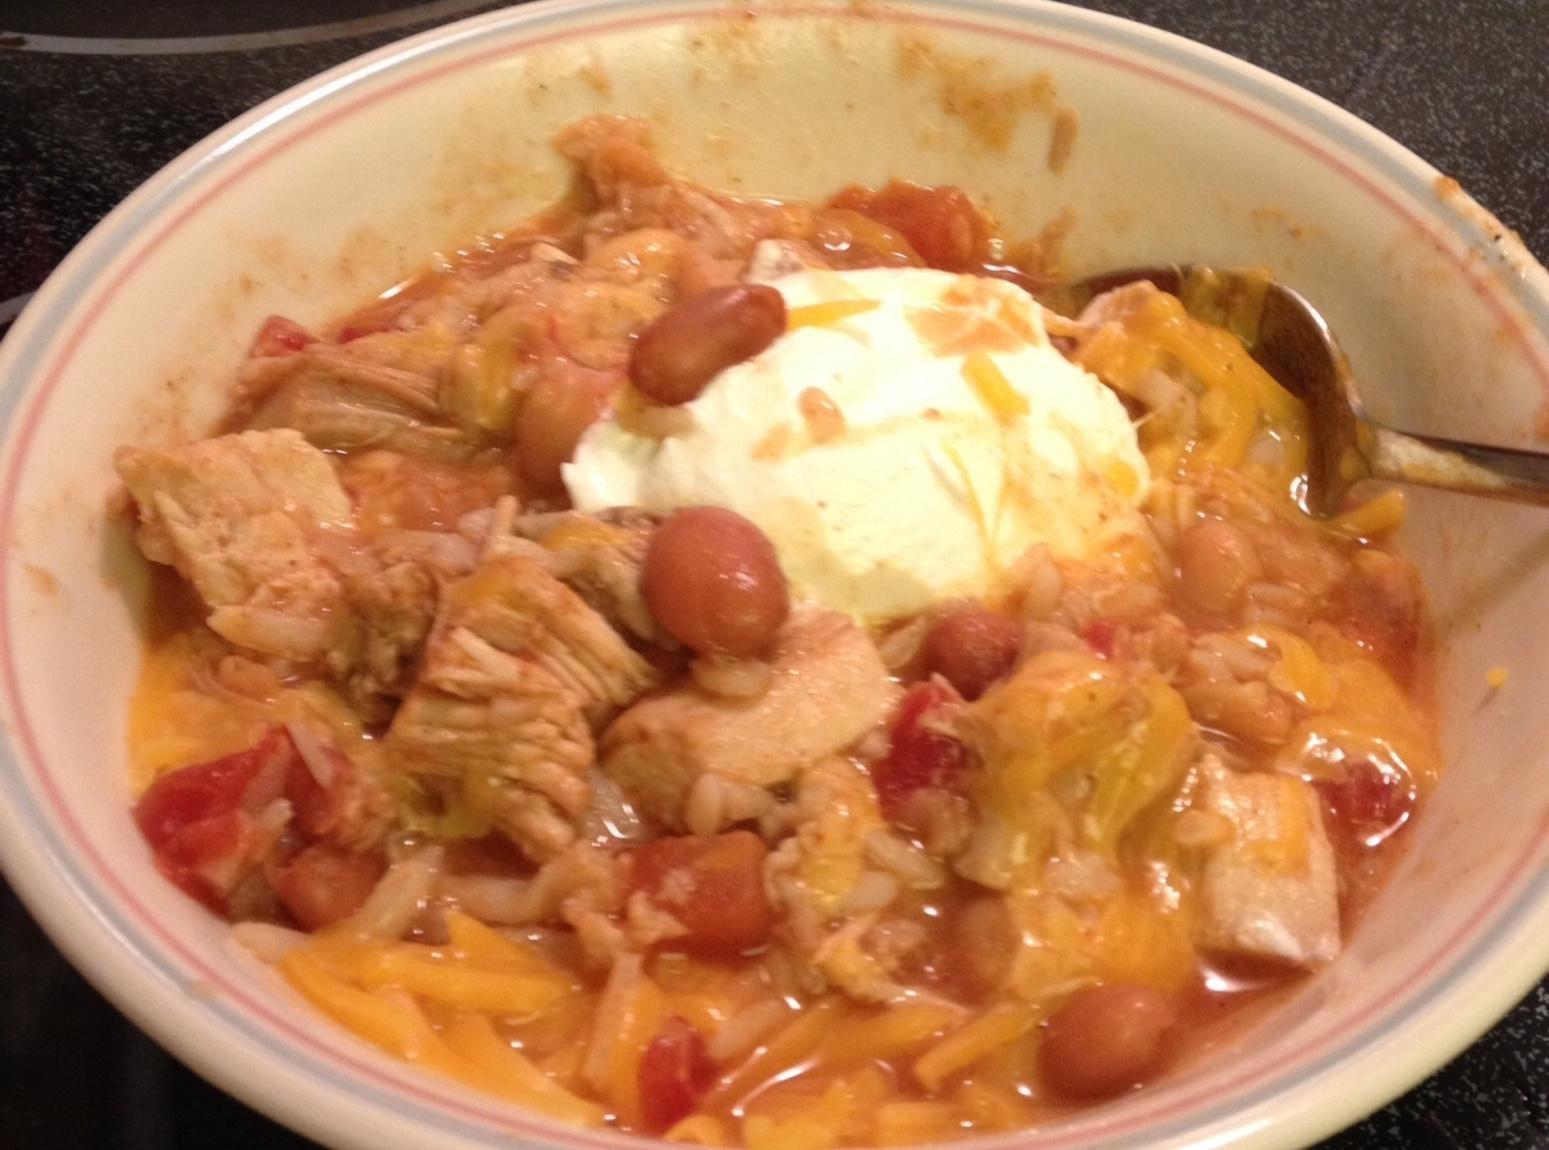 Low Fat Slow Cooker Recipes  Low Fat Slow Cooker Turkey Taco Soup Recipe